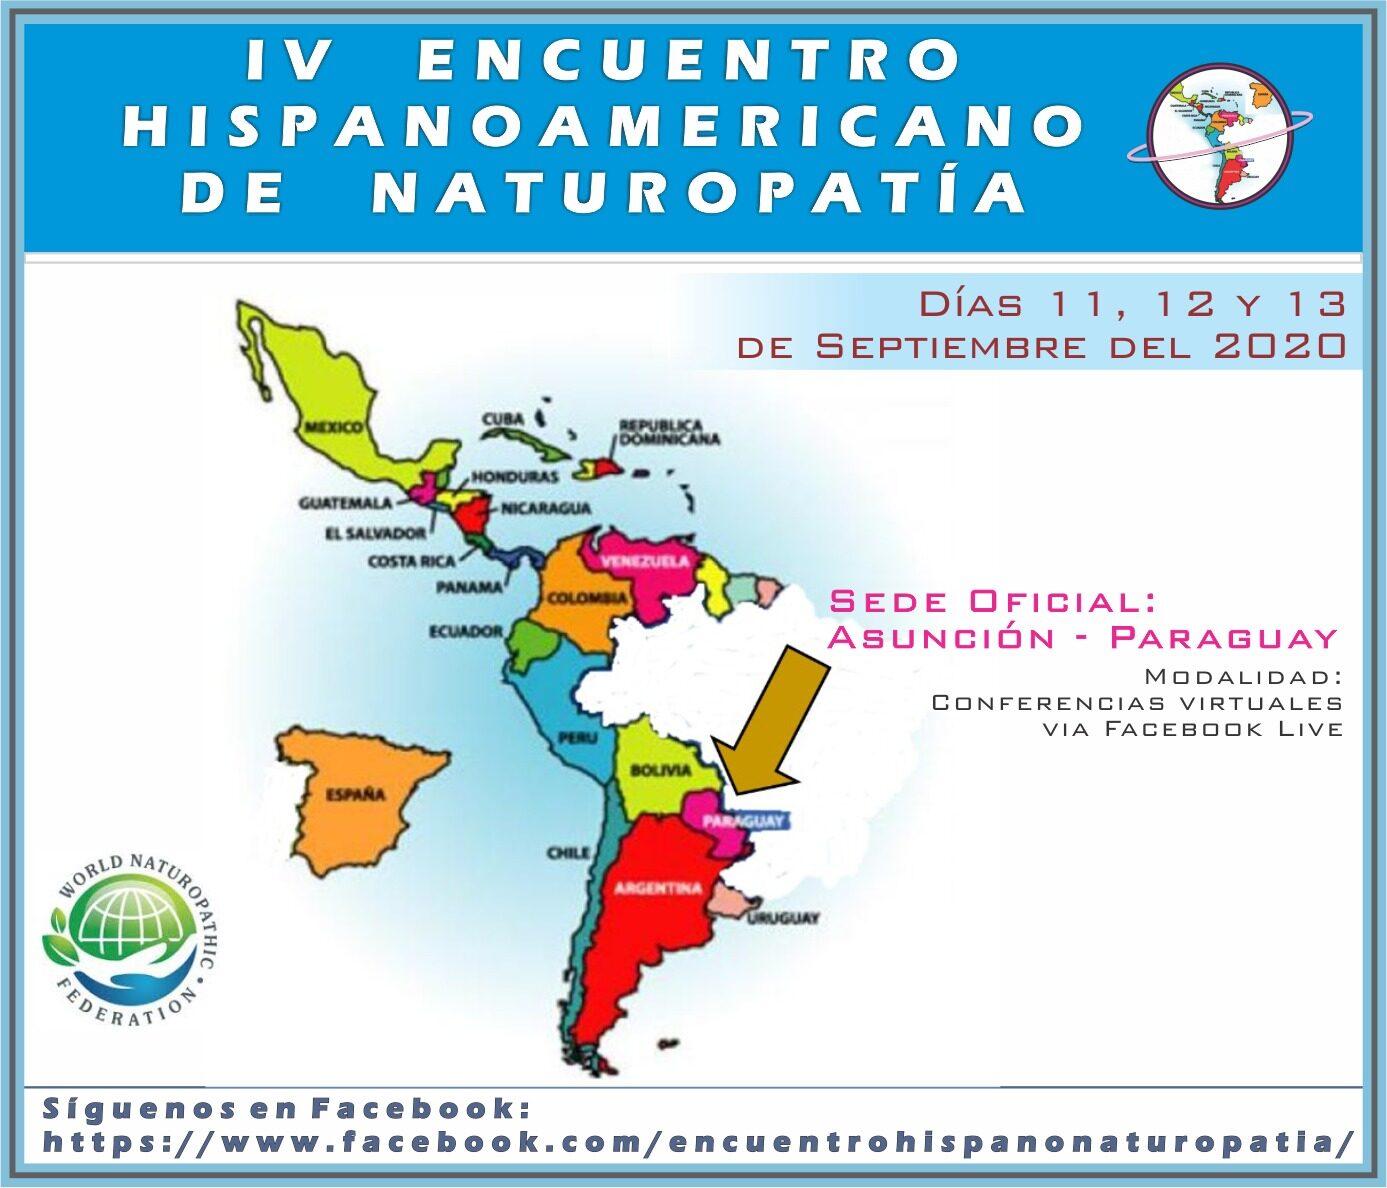 IV ENCUENTRO HISPANOAMERICANO DE NATUROPATÍA